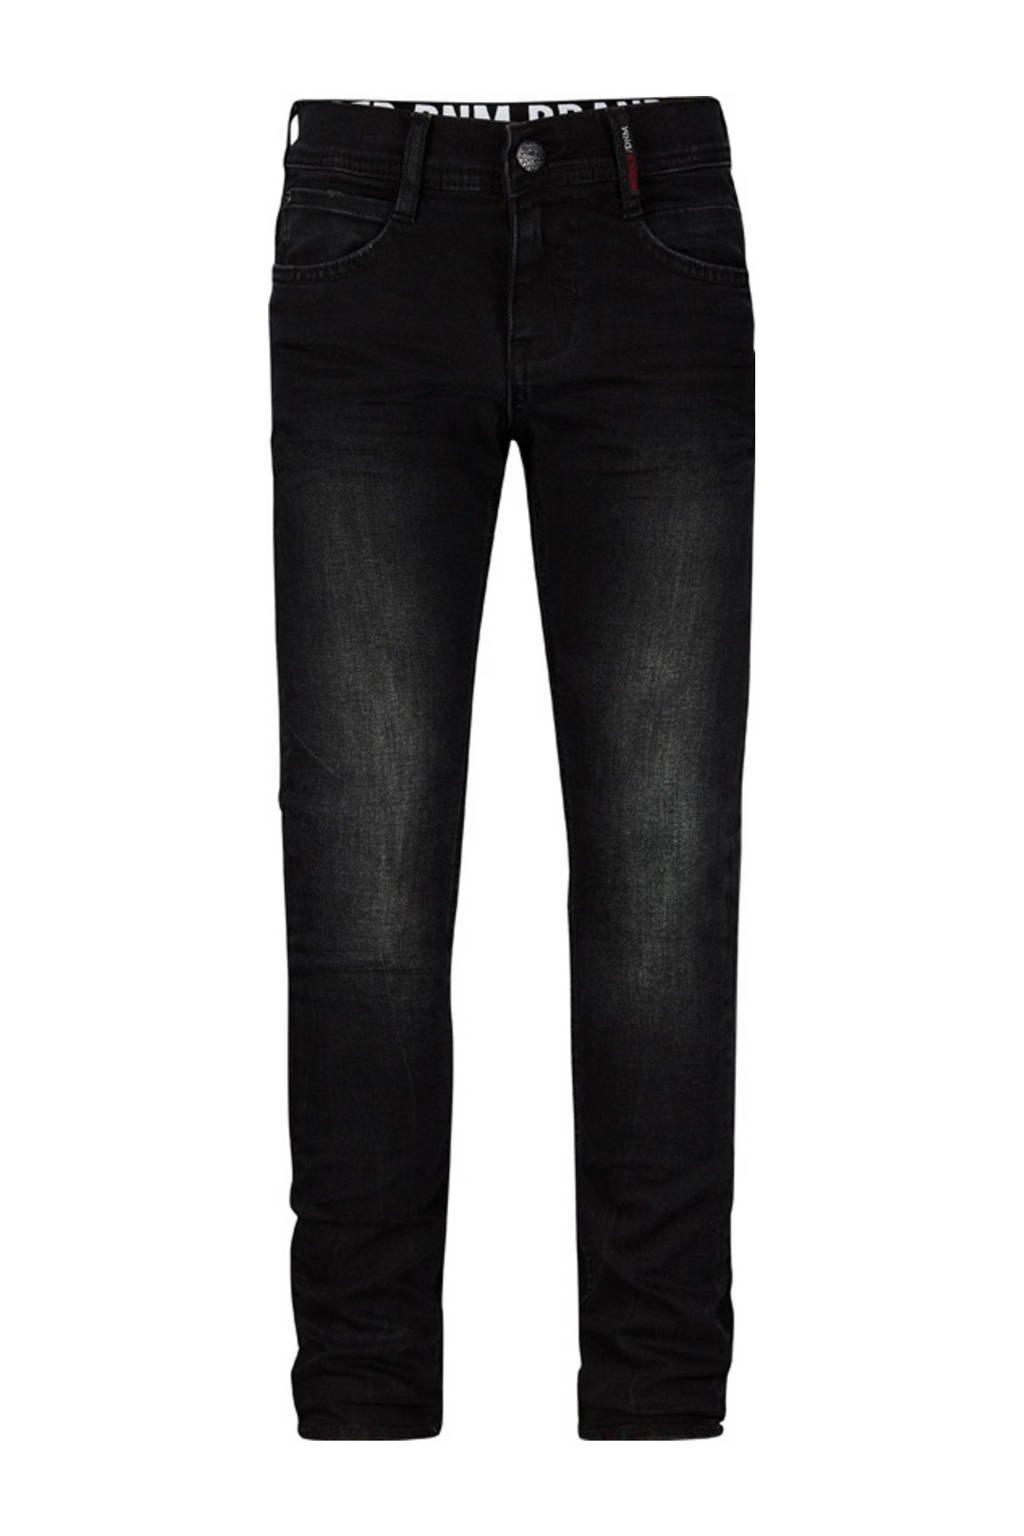 Retour Denim regular fit jeans Tobias black denim, Black denim